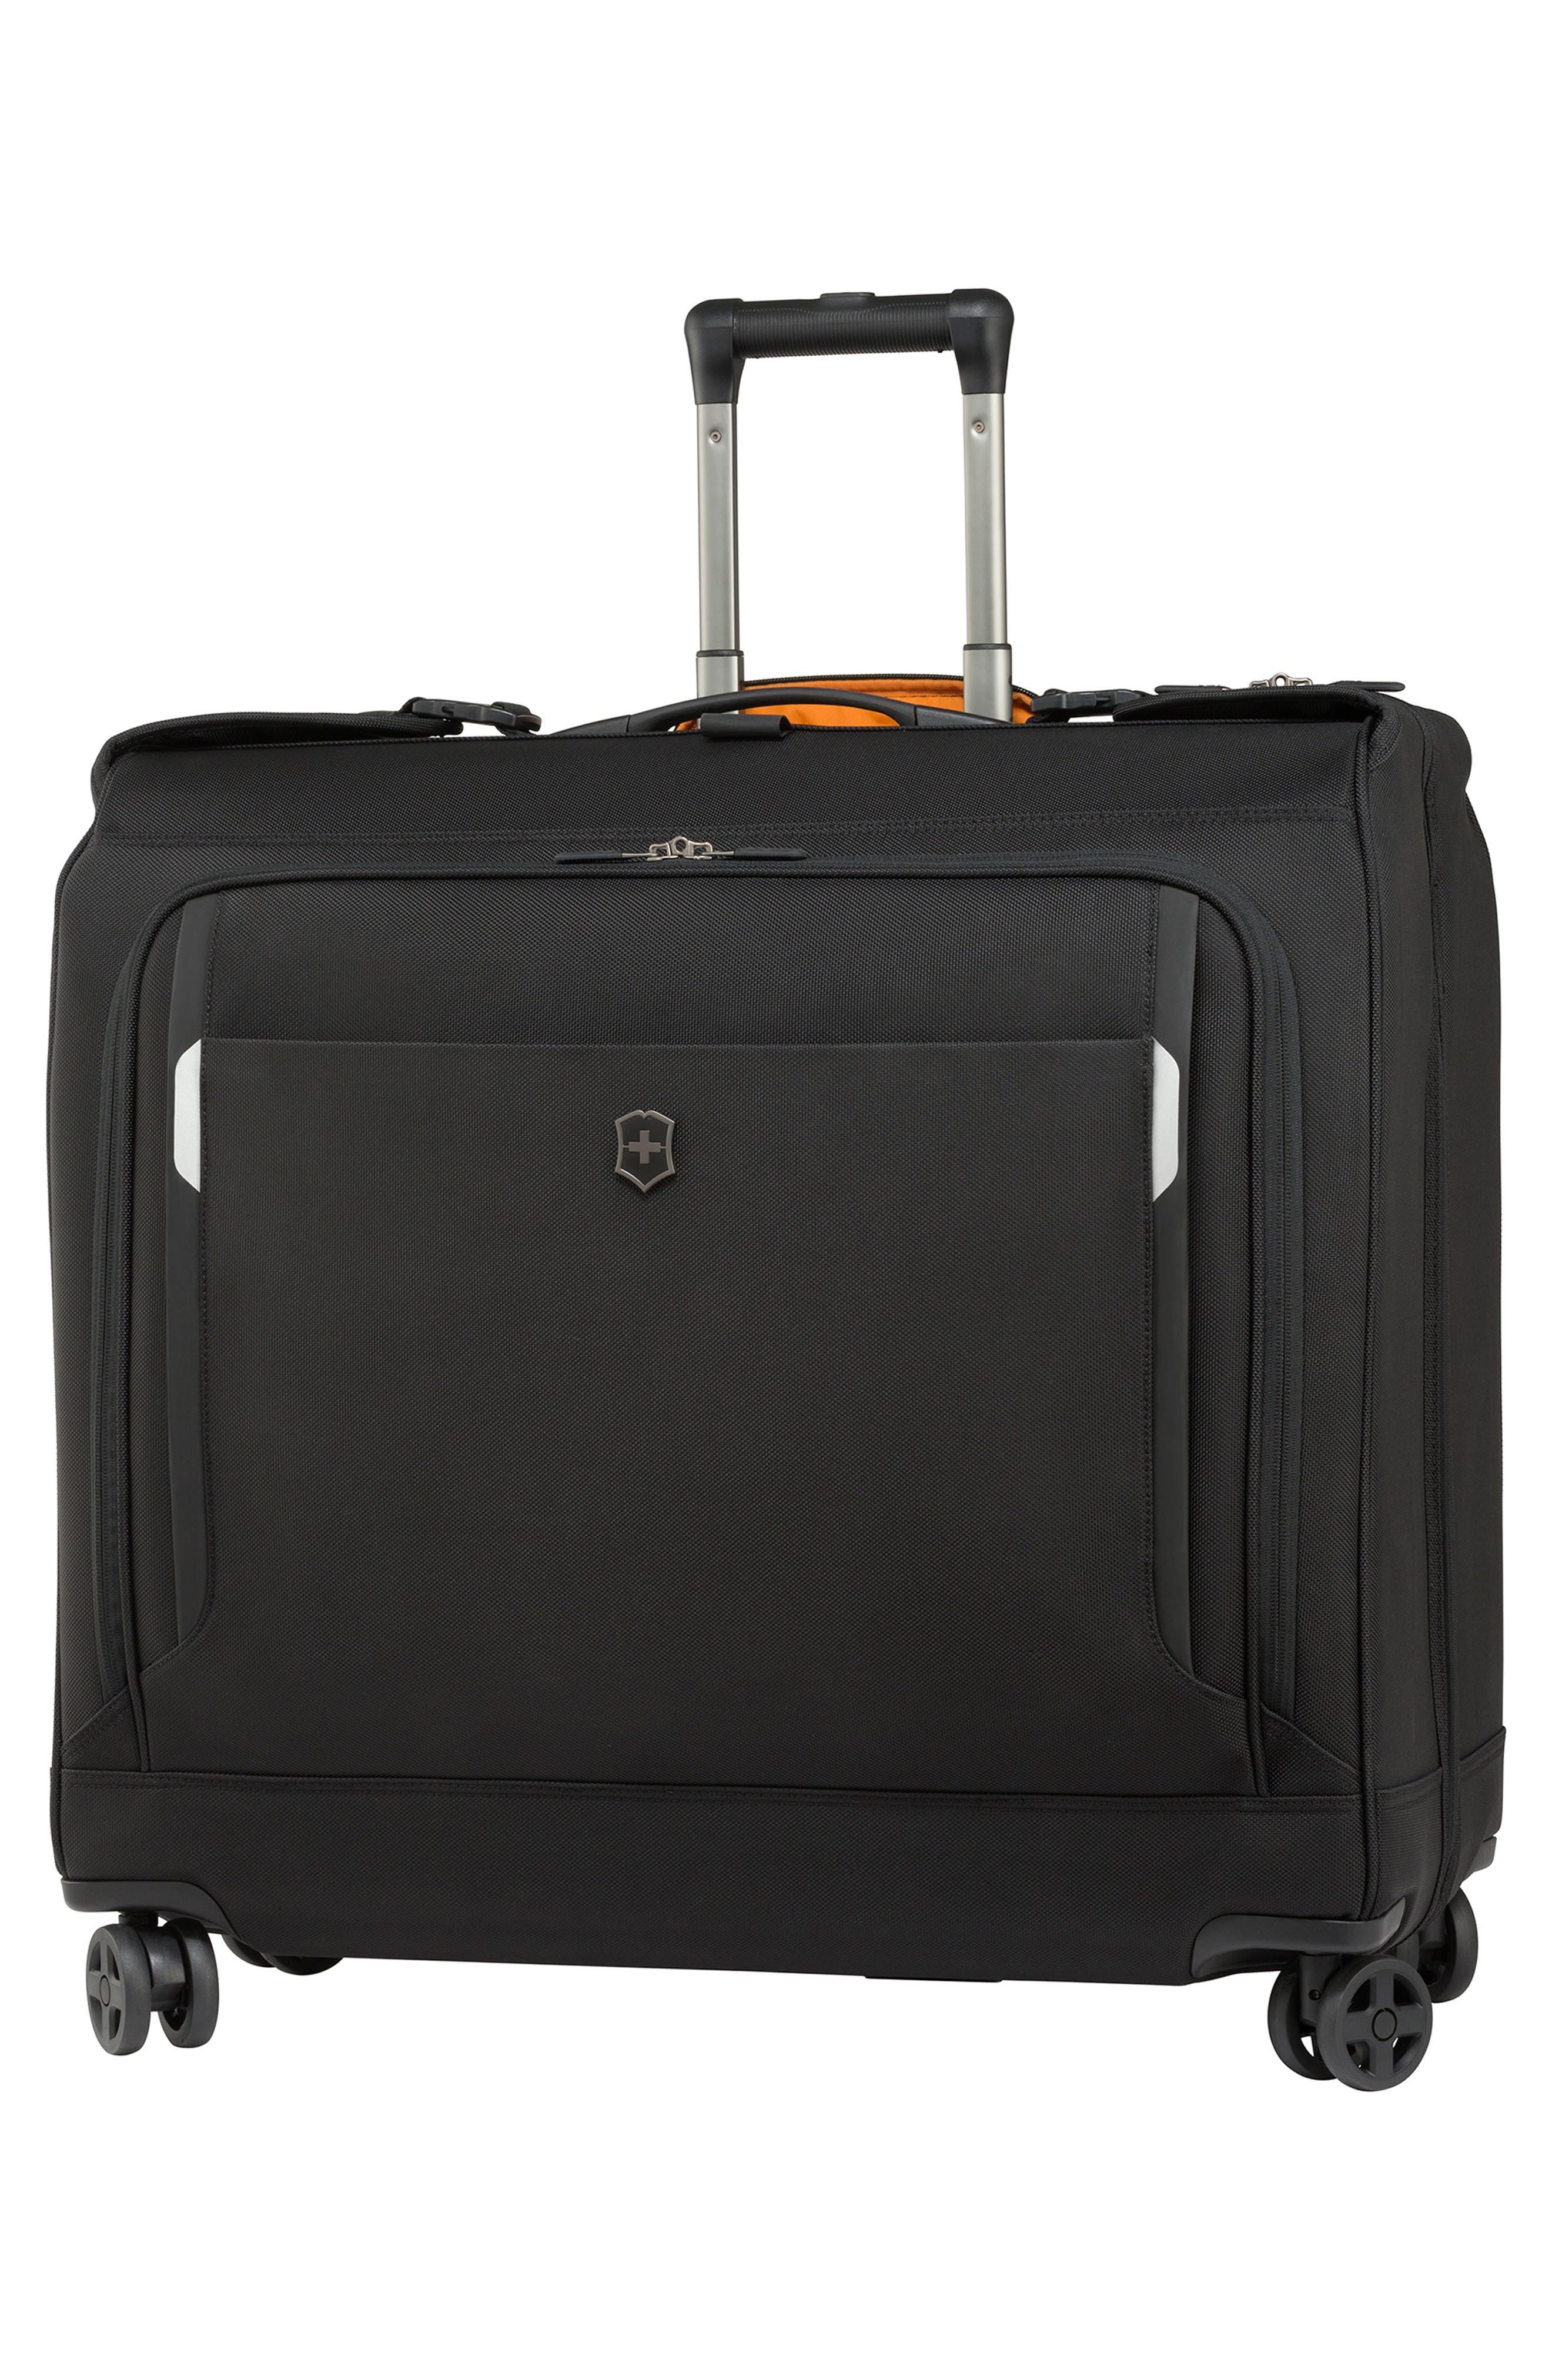 WT 5.0 Dual Caster Wheeled Garment Bag,                         Main,                         color, 001